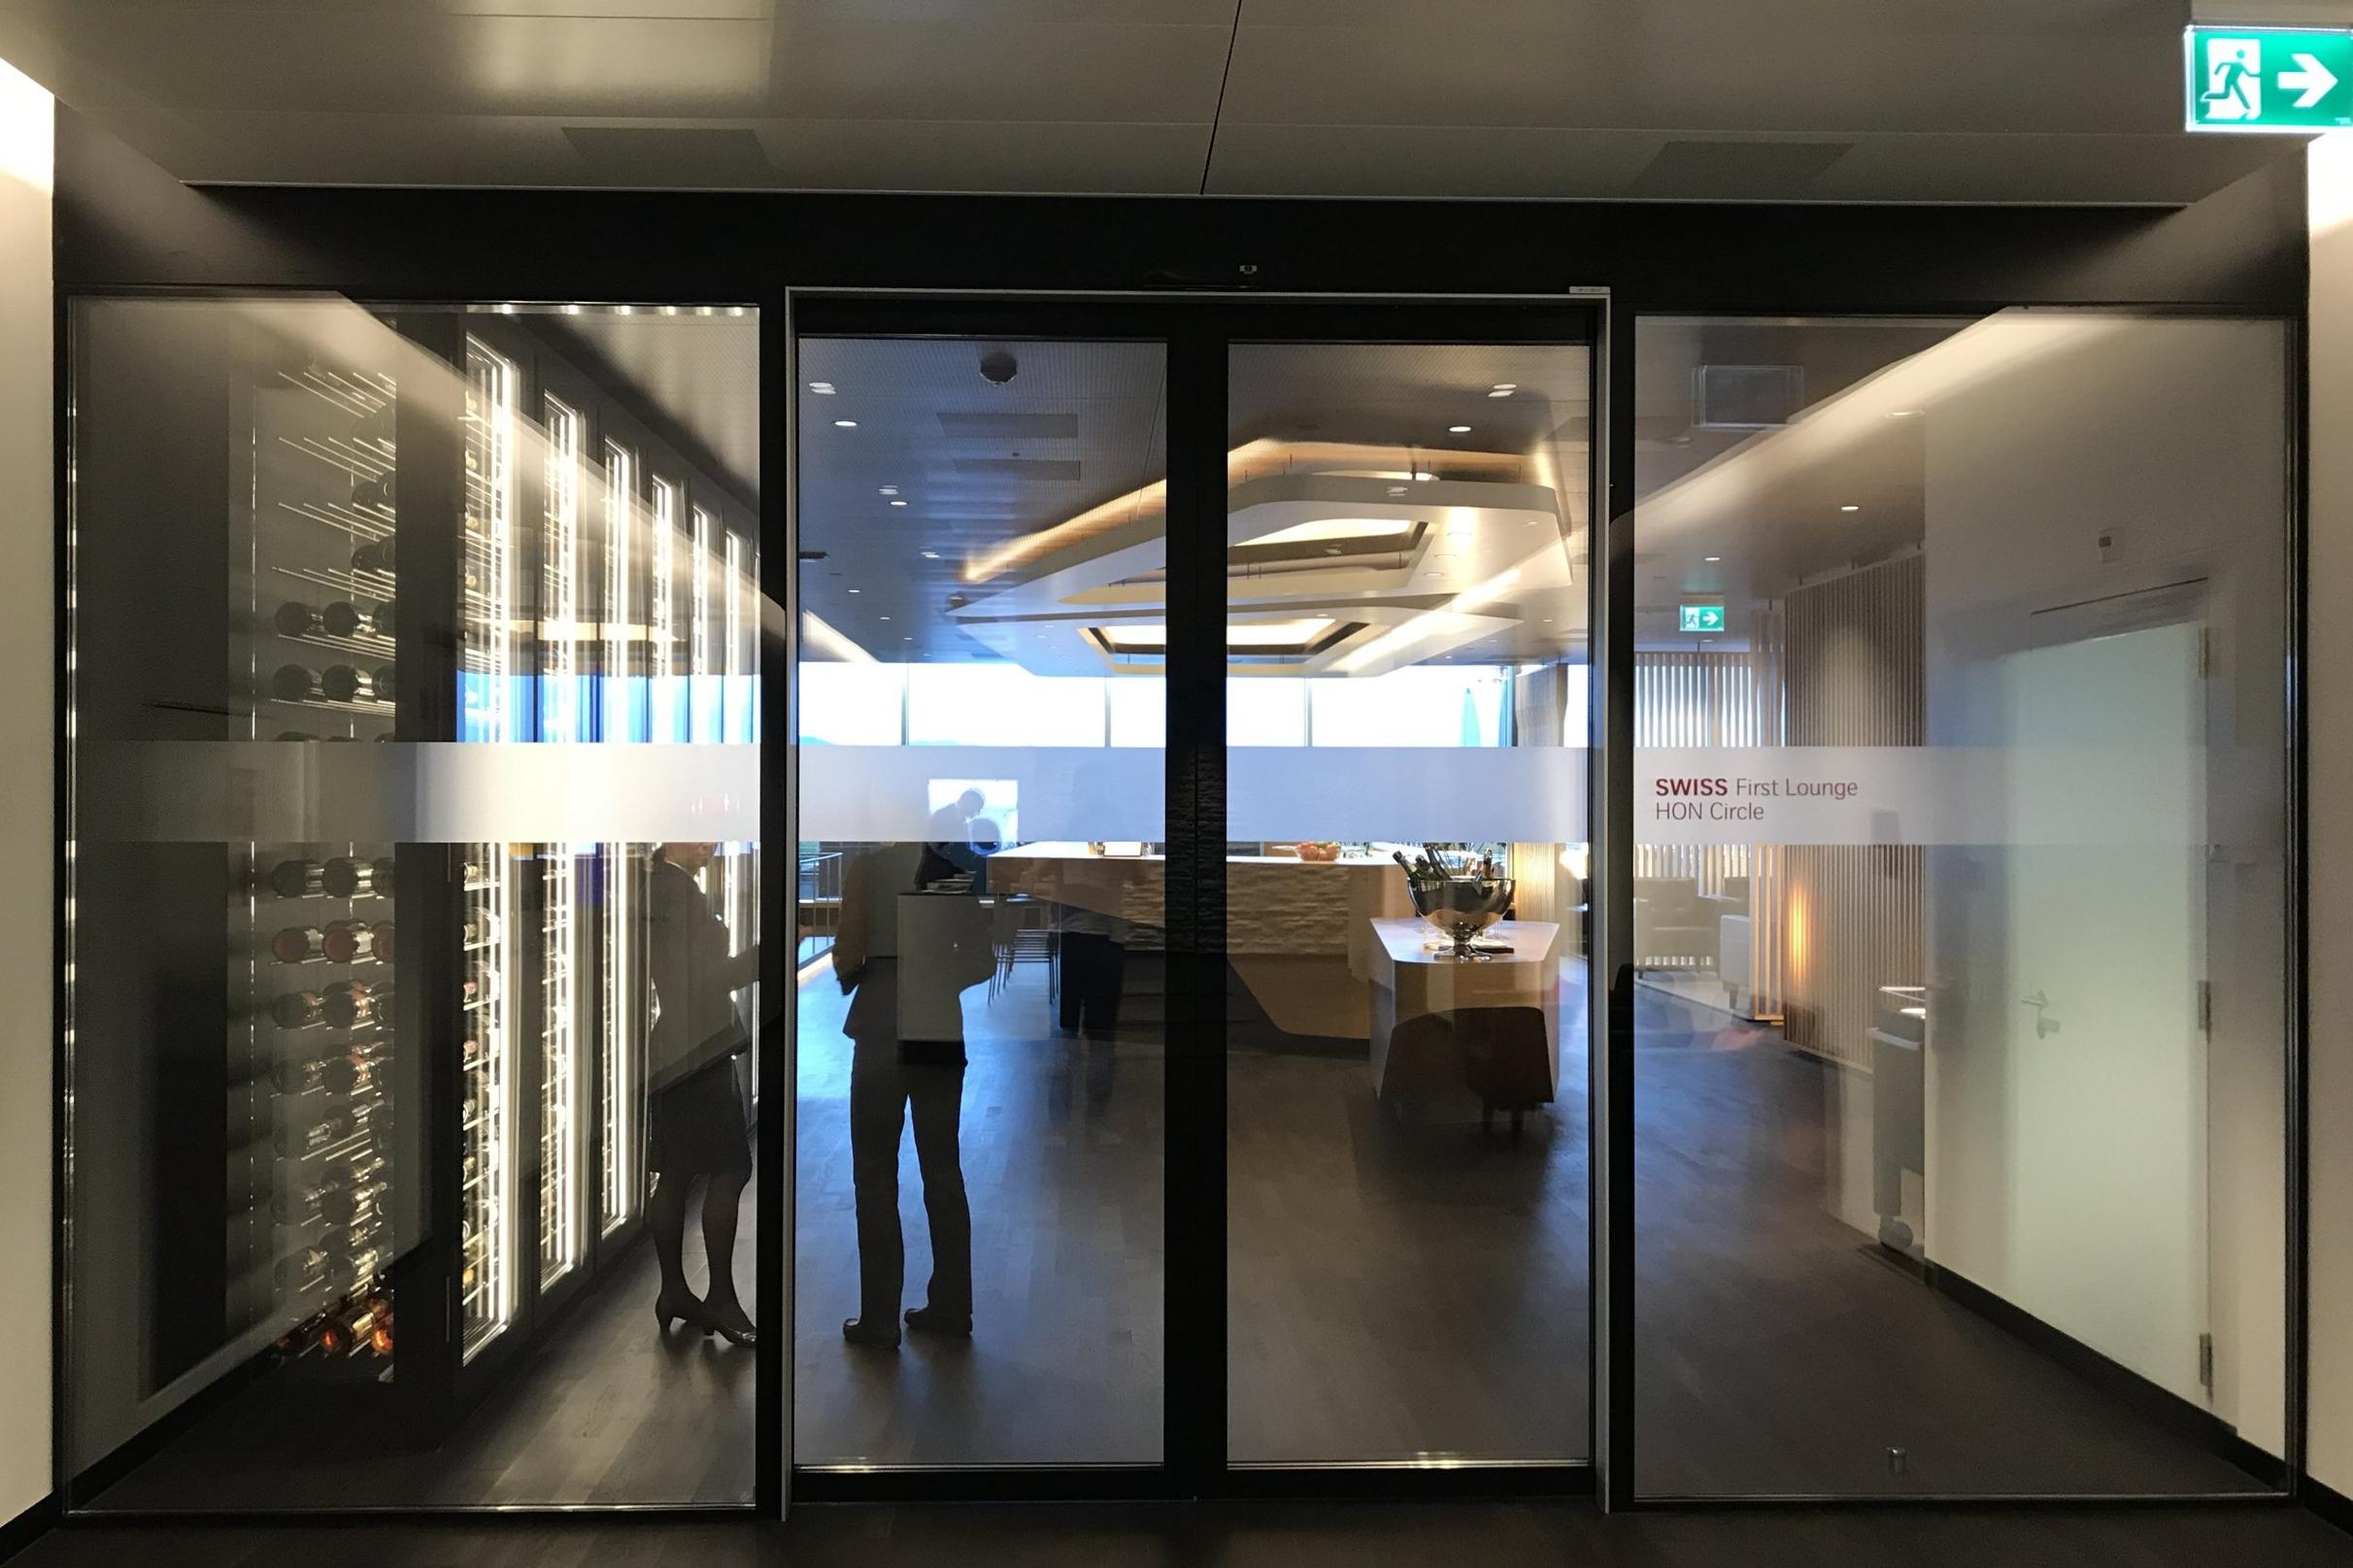 Swiss First Class Lounge Zurich – Lounge entrance